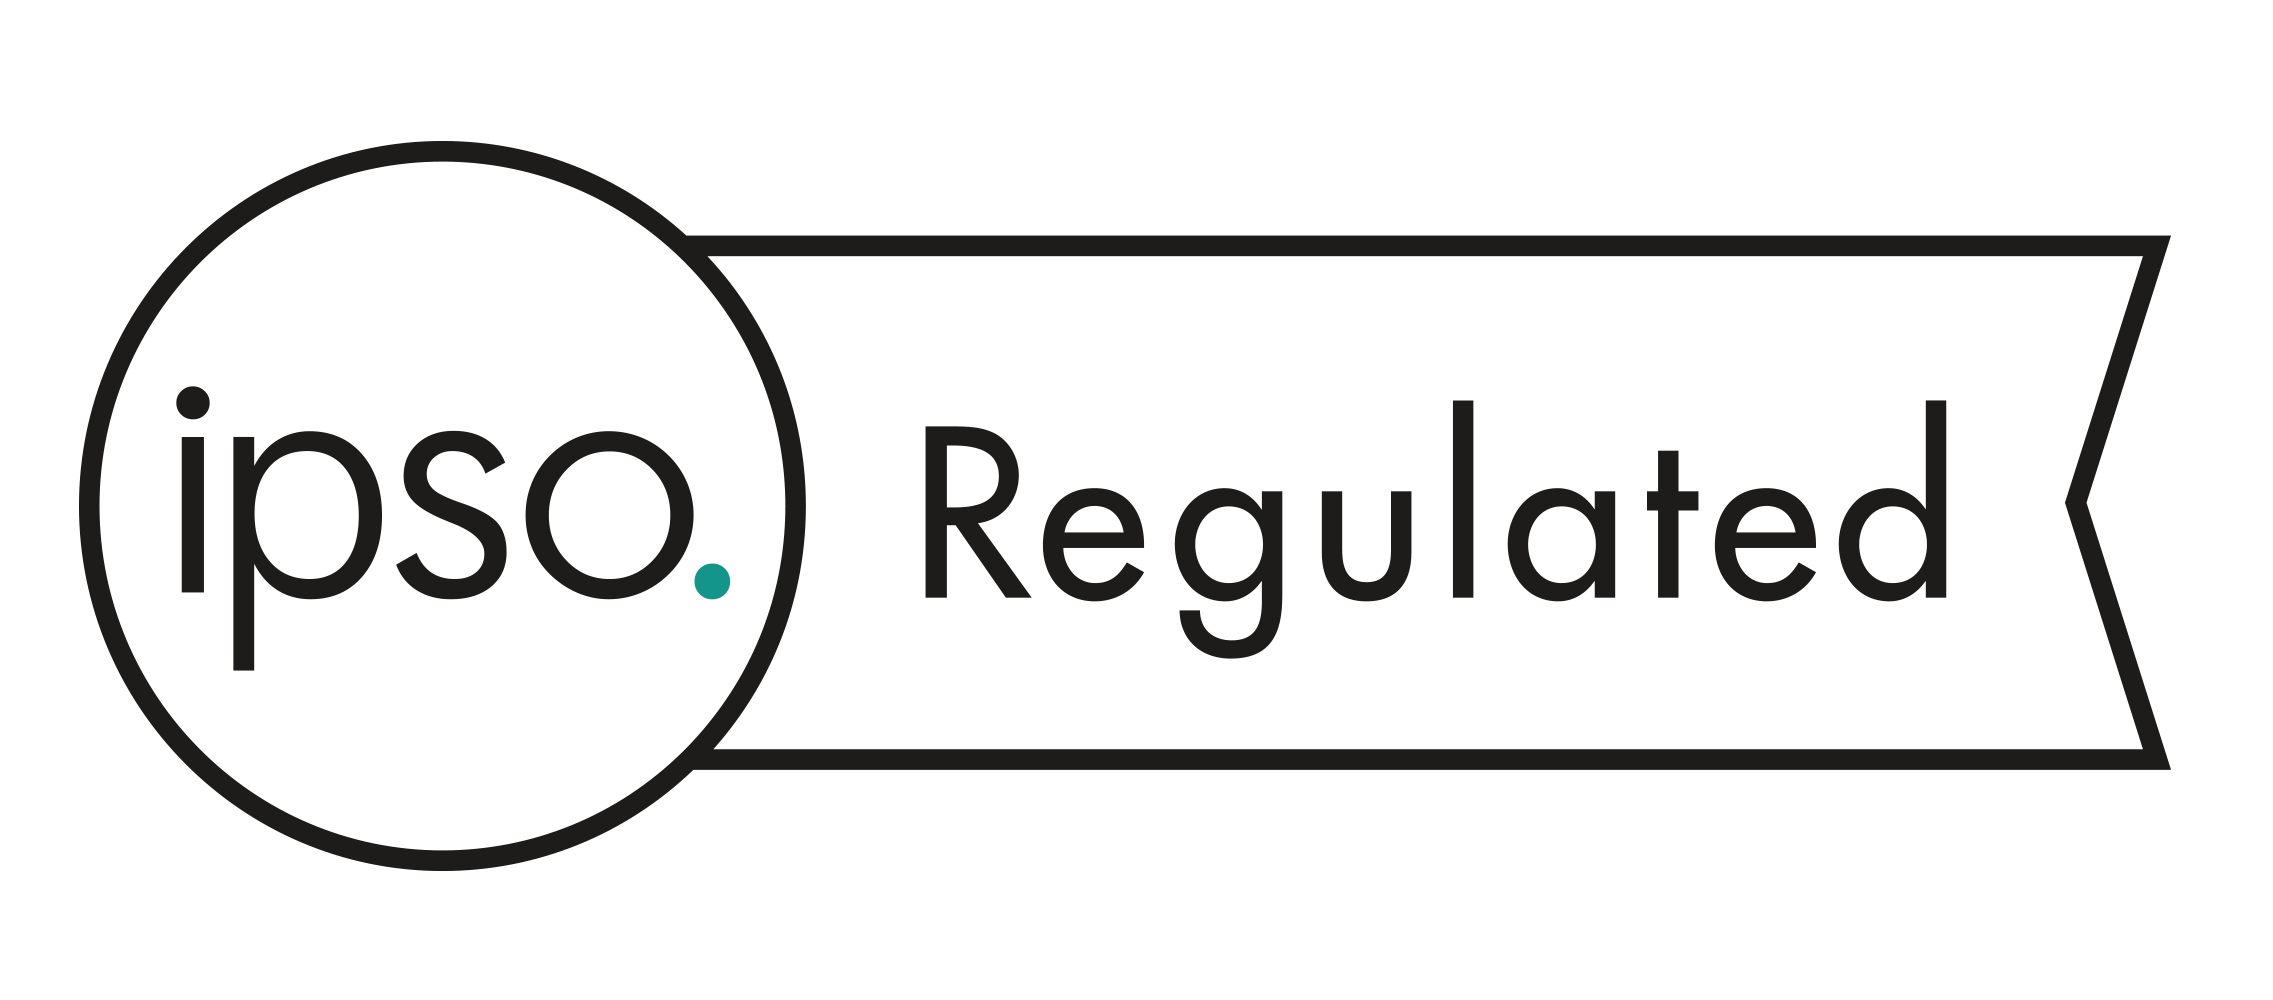 ipso_regulated_hires.jpg